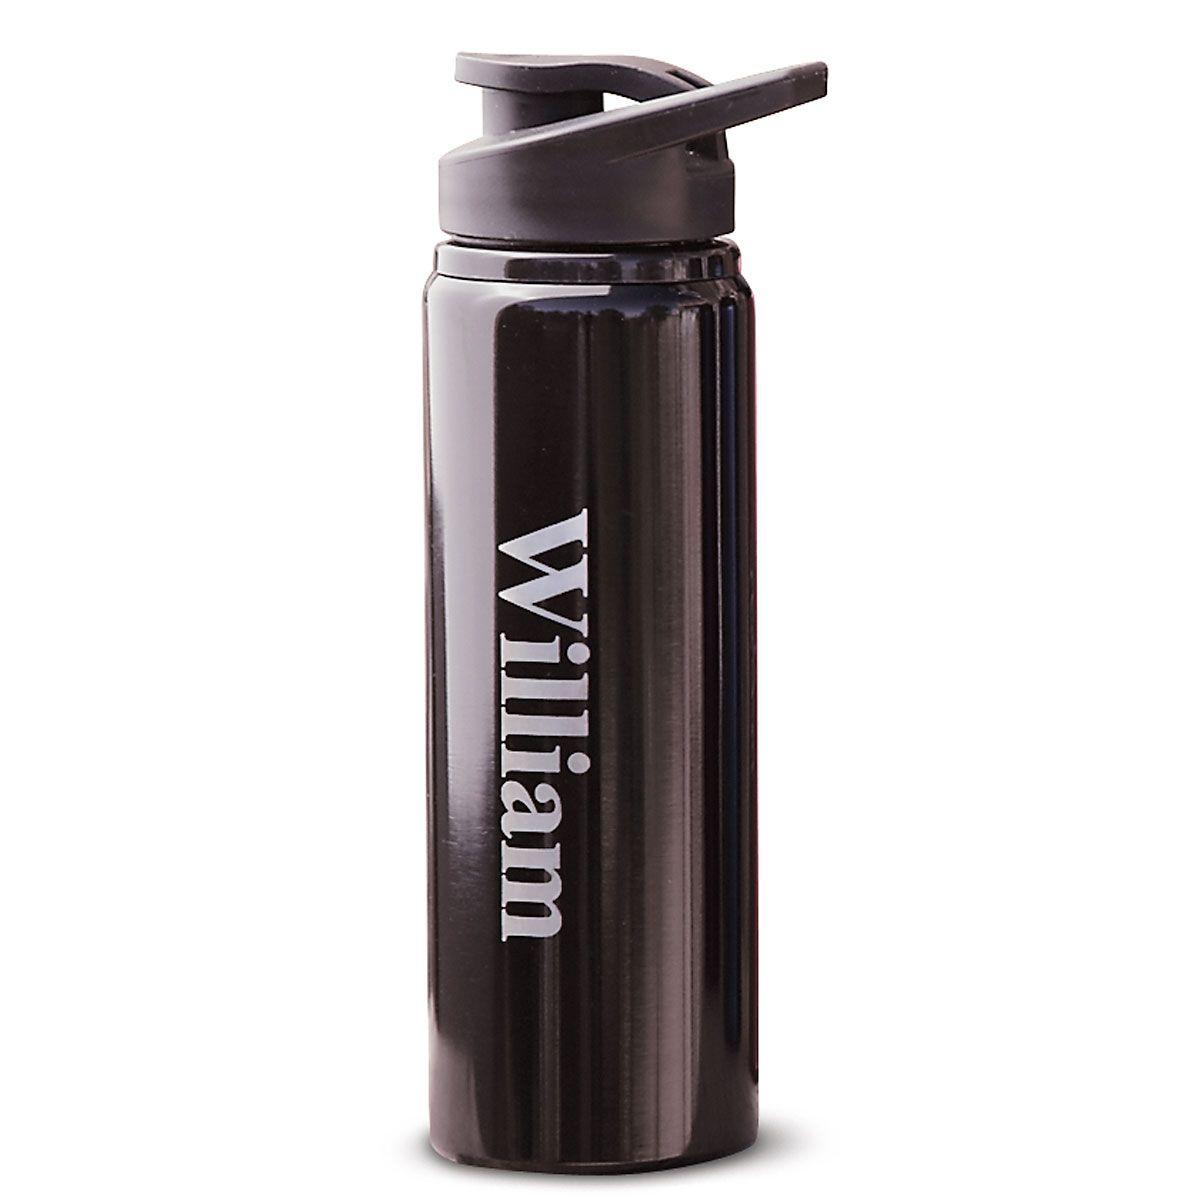 Personalized Anodized Aluminum Water Bottles